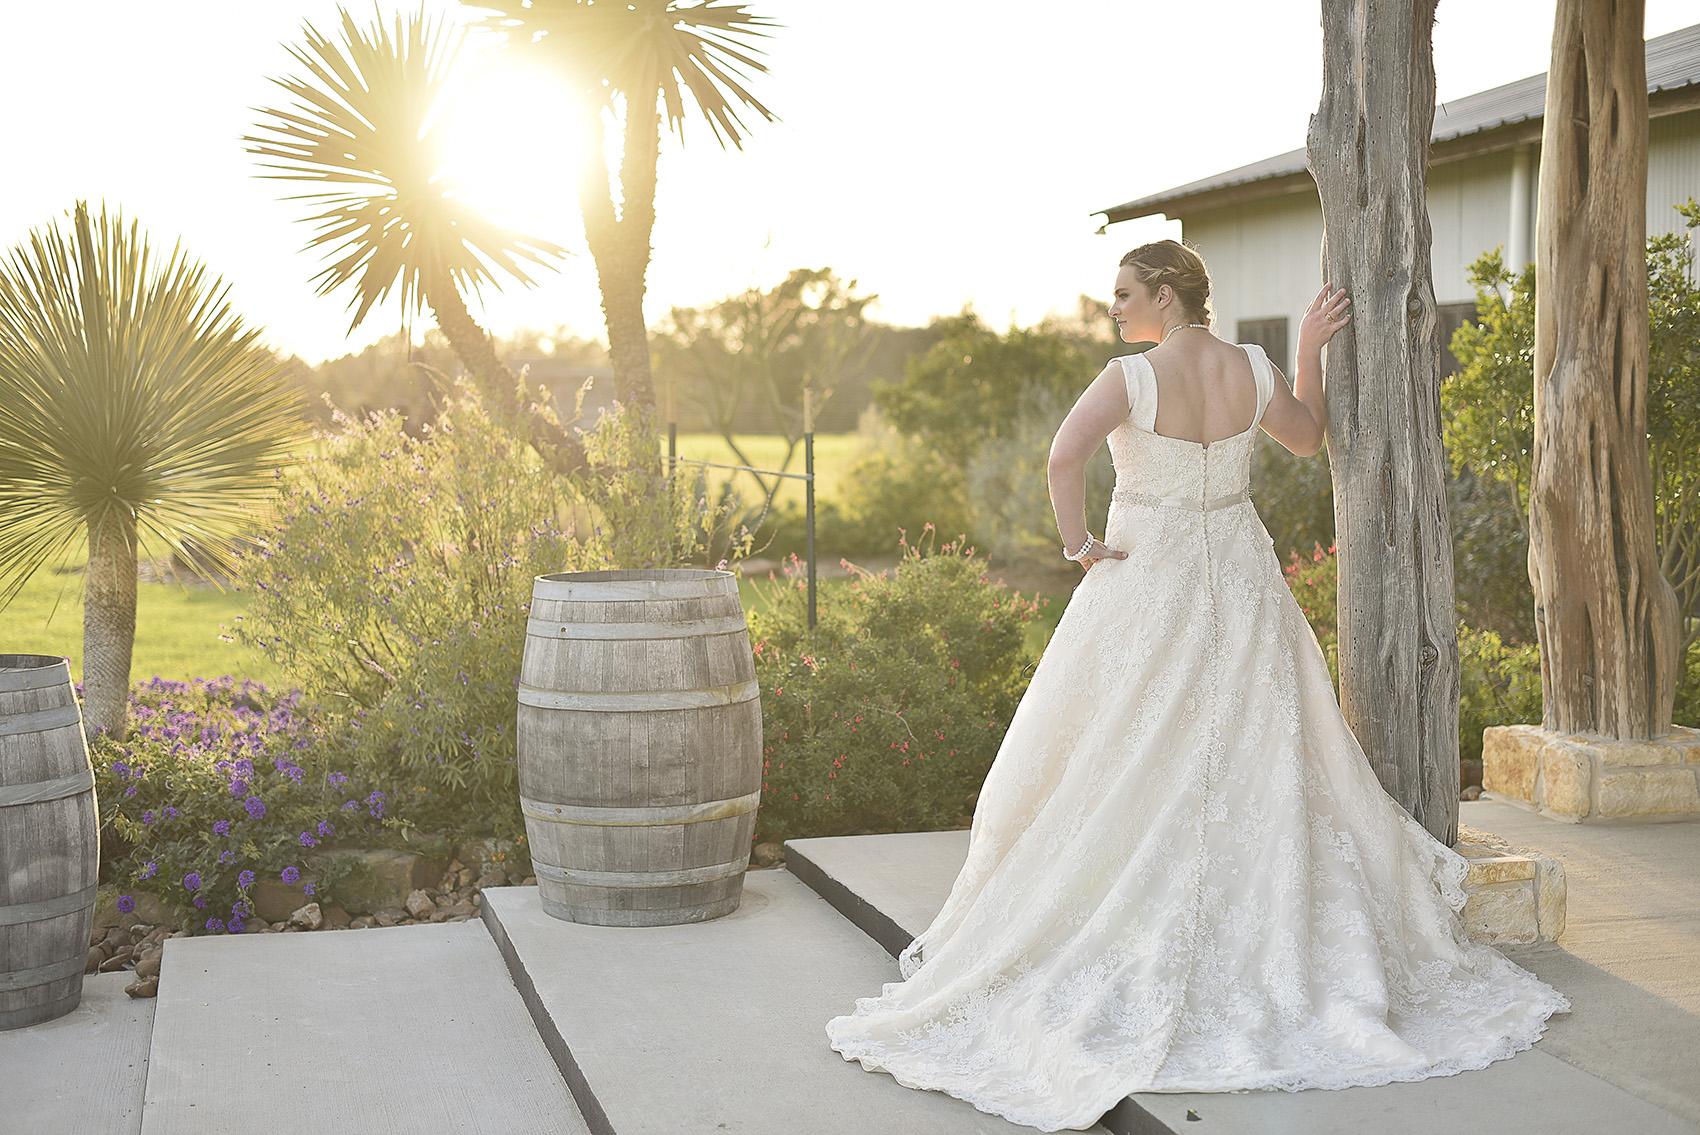 houston-tomball-moffitt-oaks-bridal-photo-rustic-scene